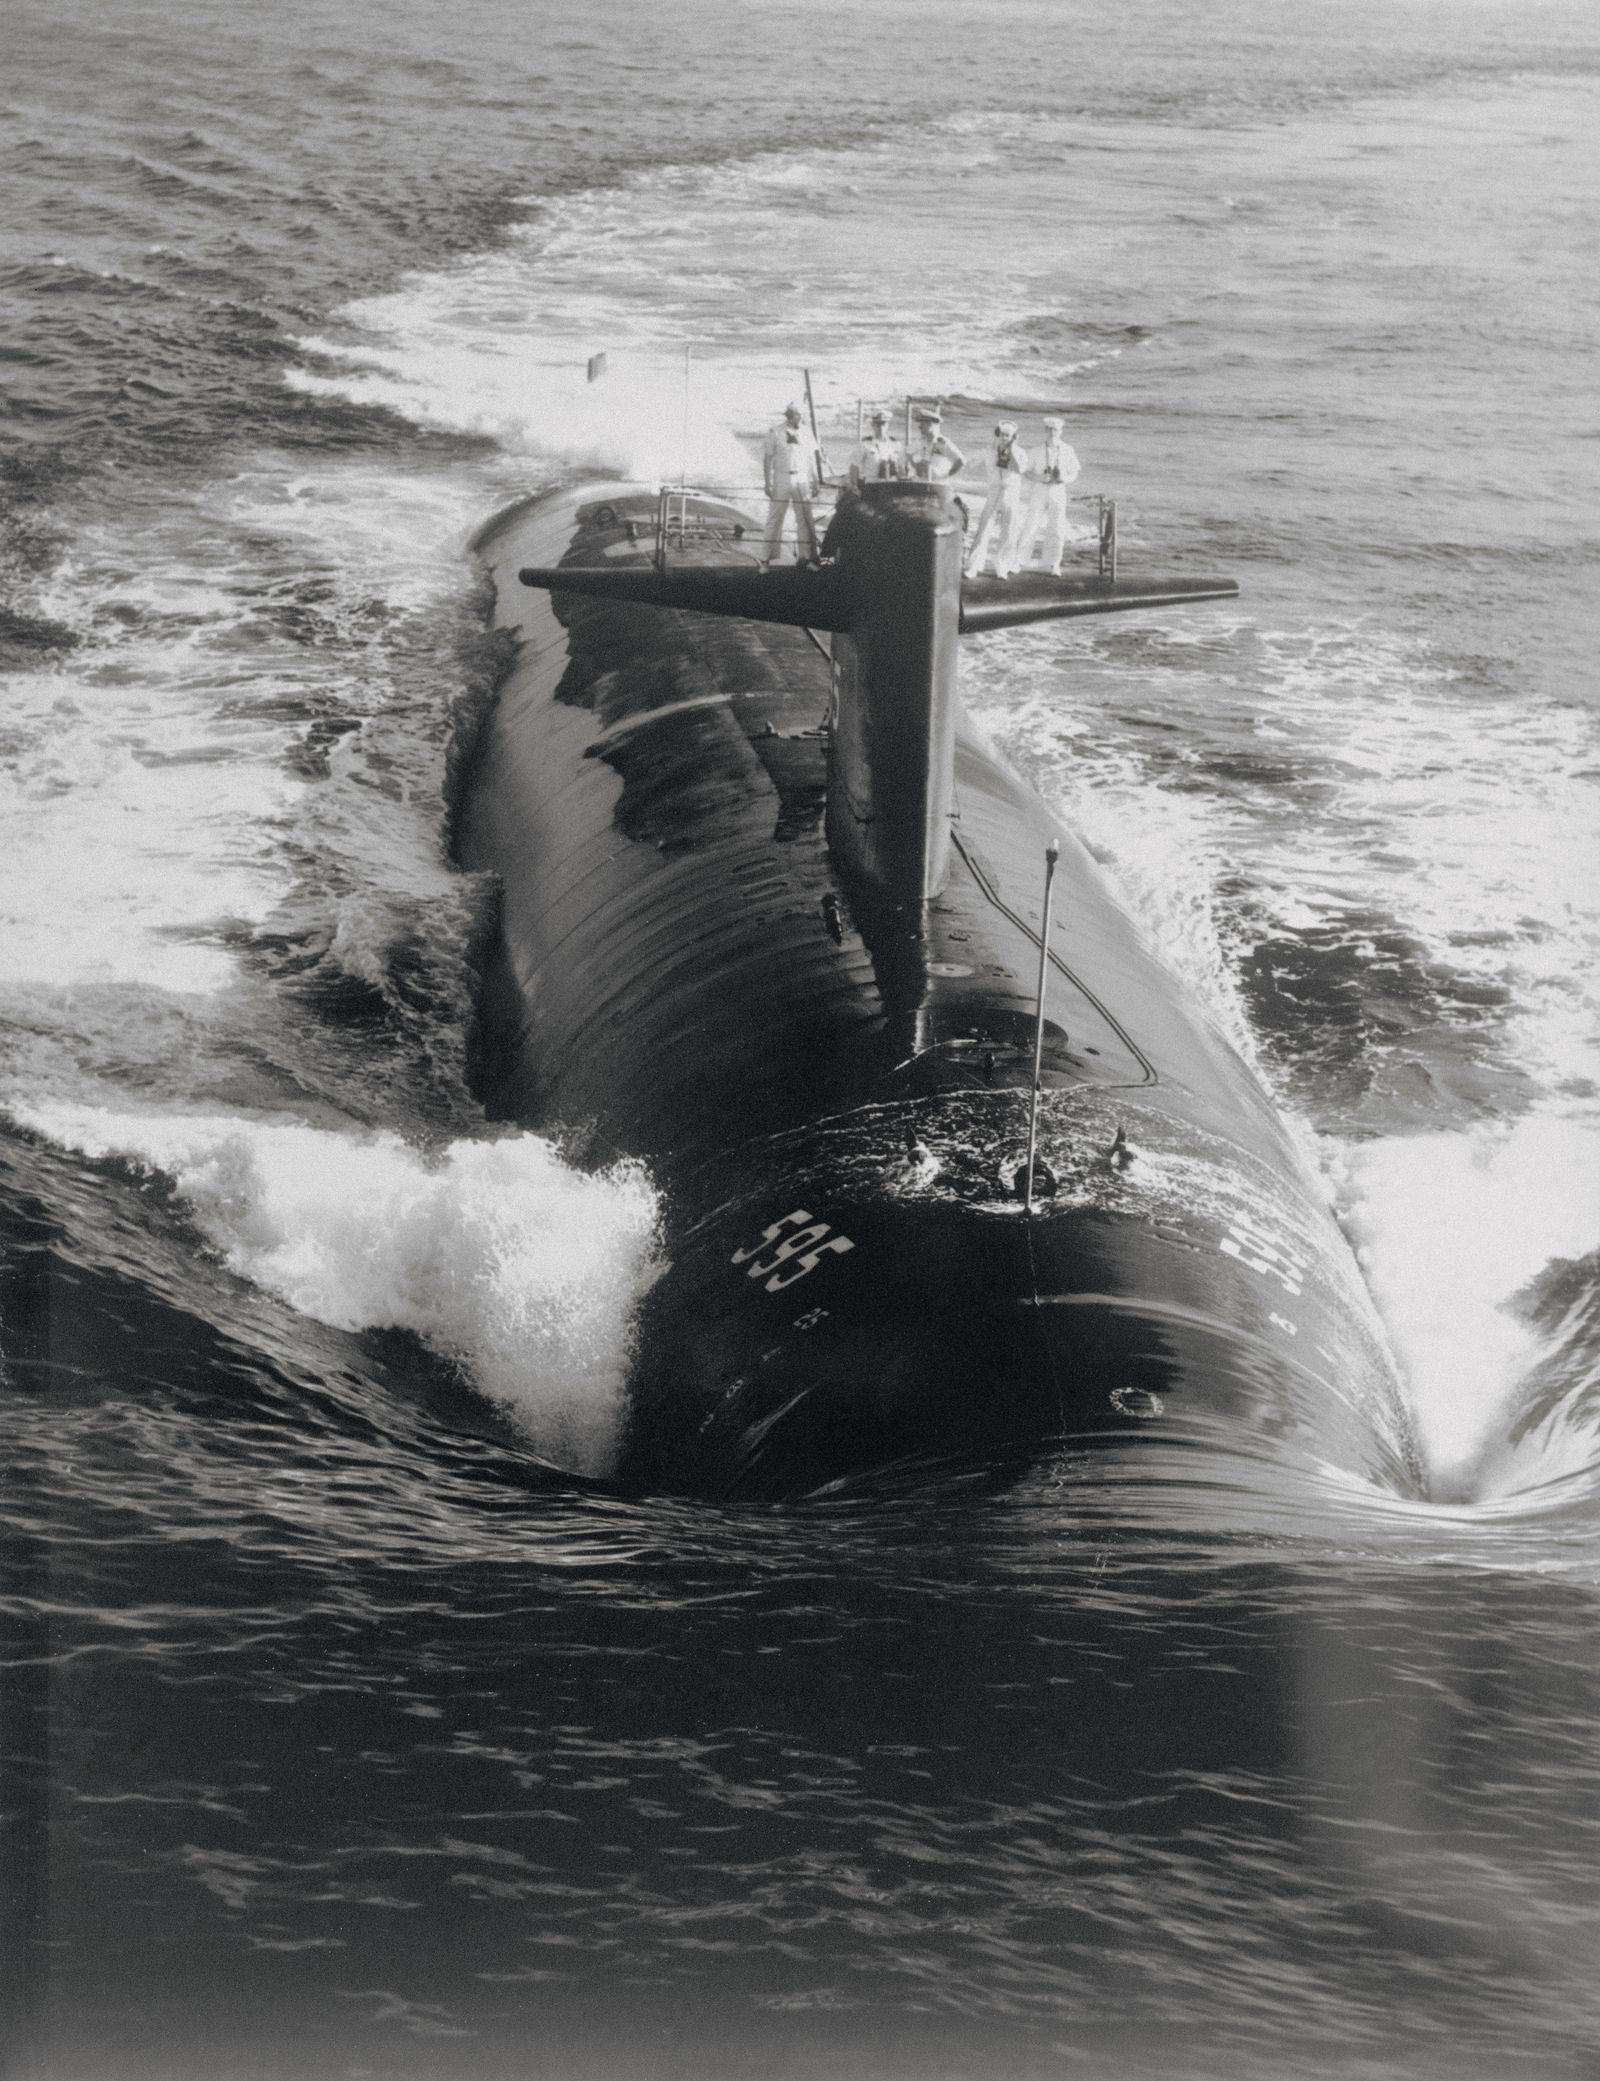 Pepsi Kriegsflotte - Sailors Atop Submarine in Water